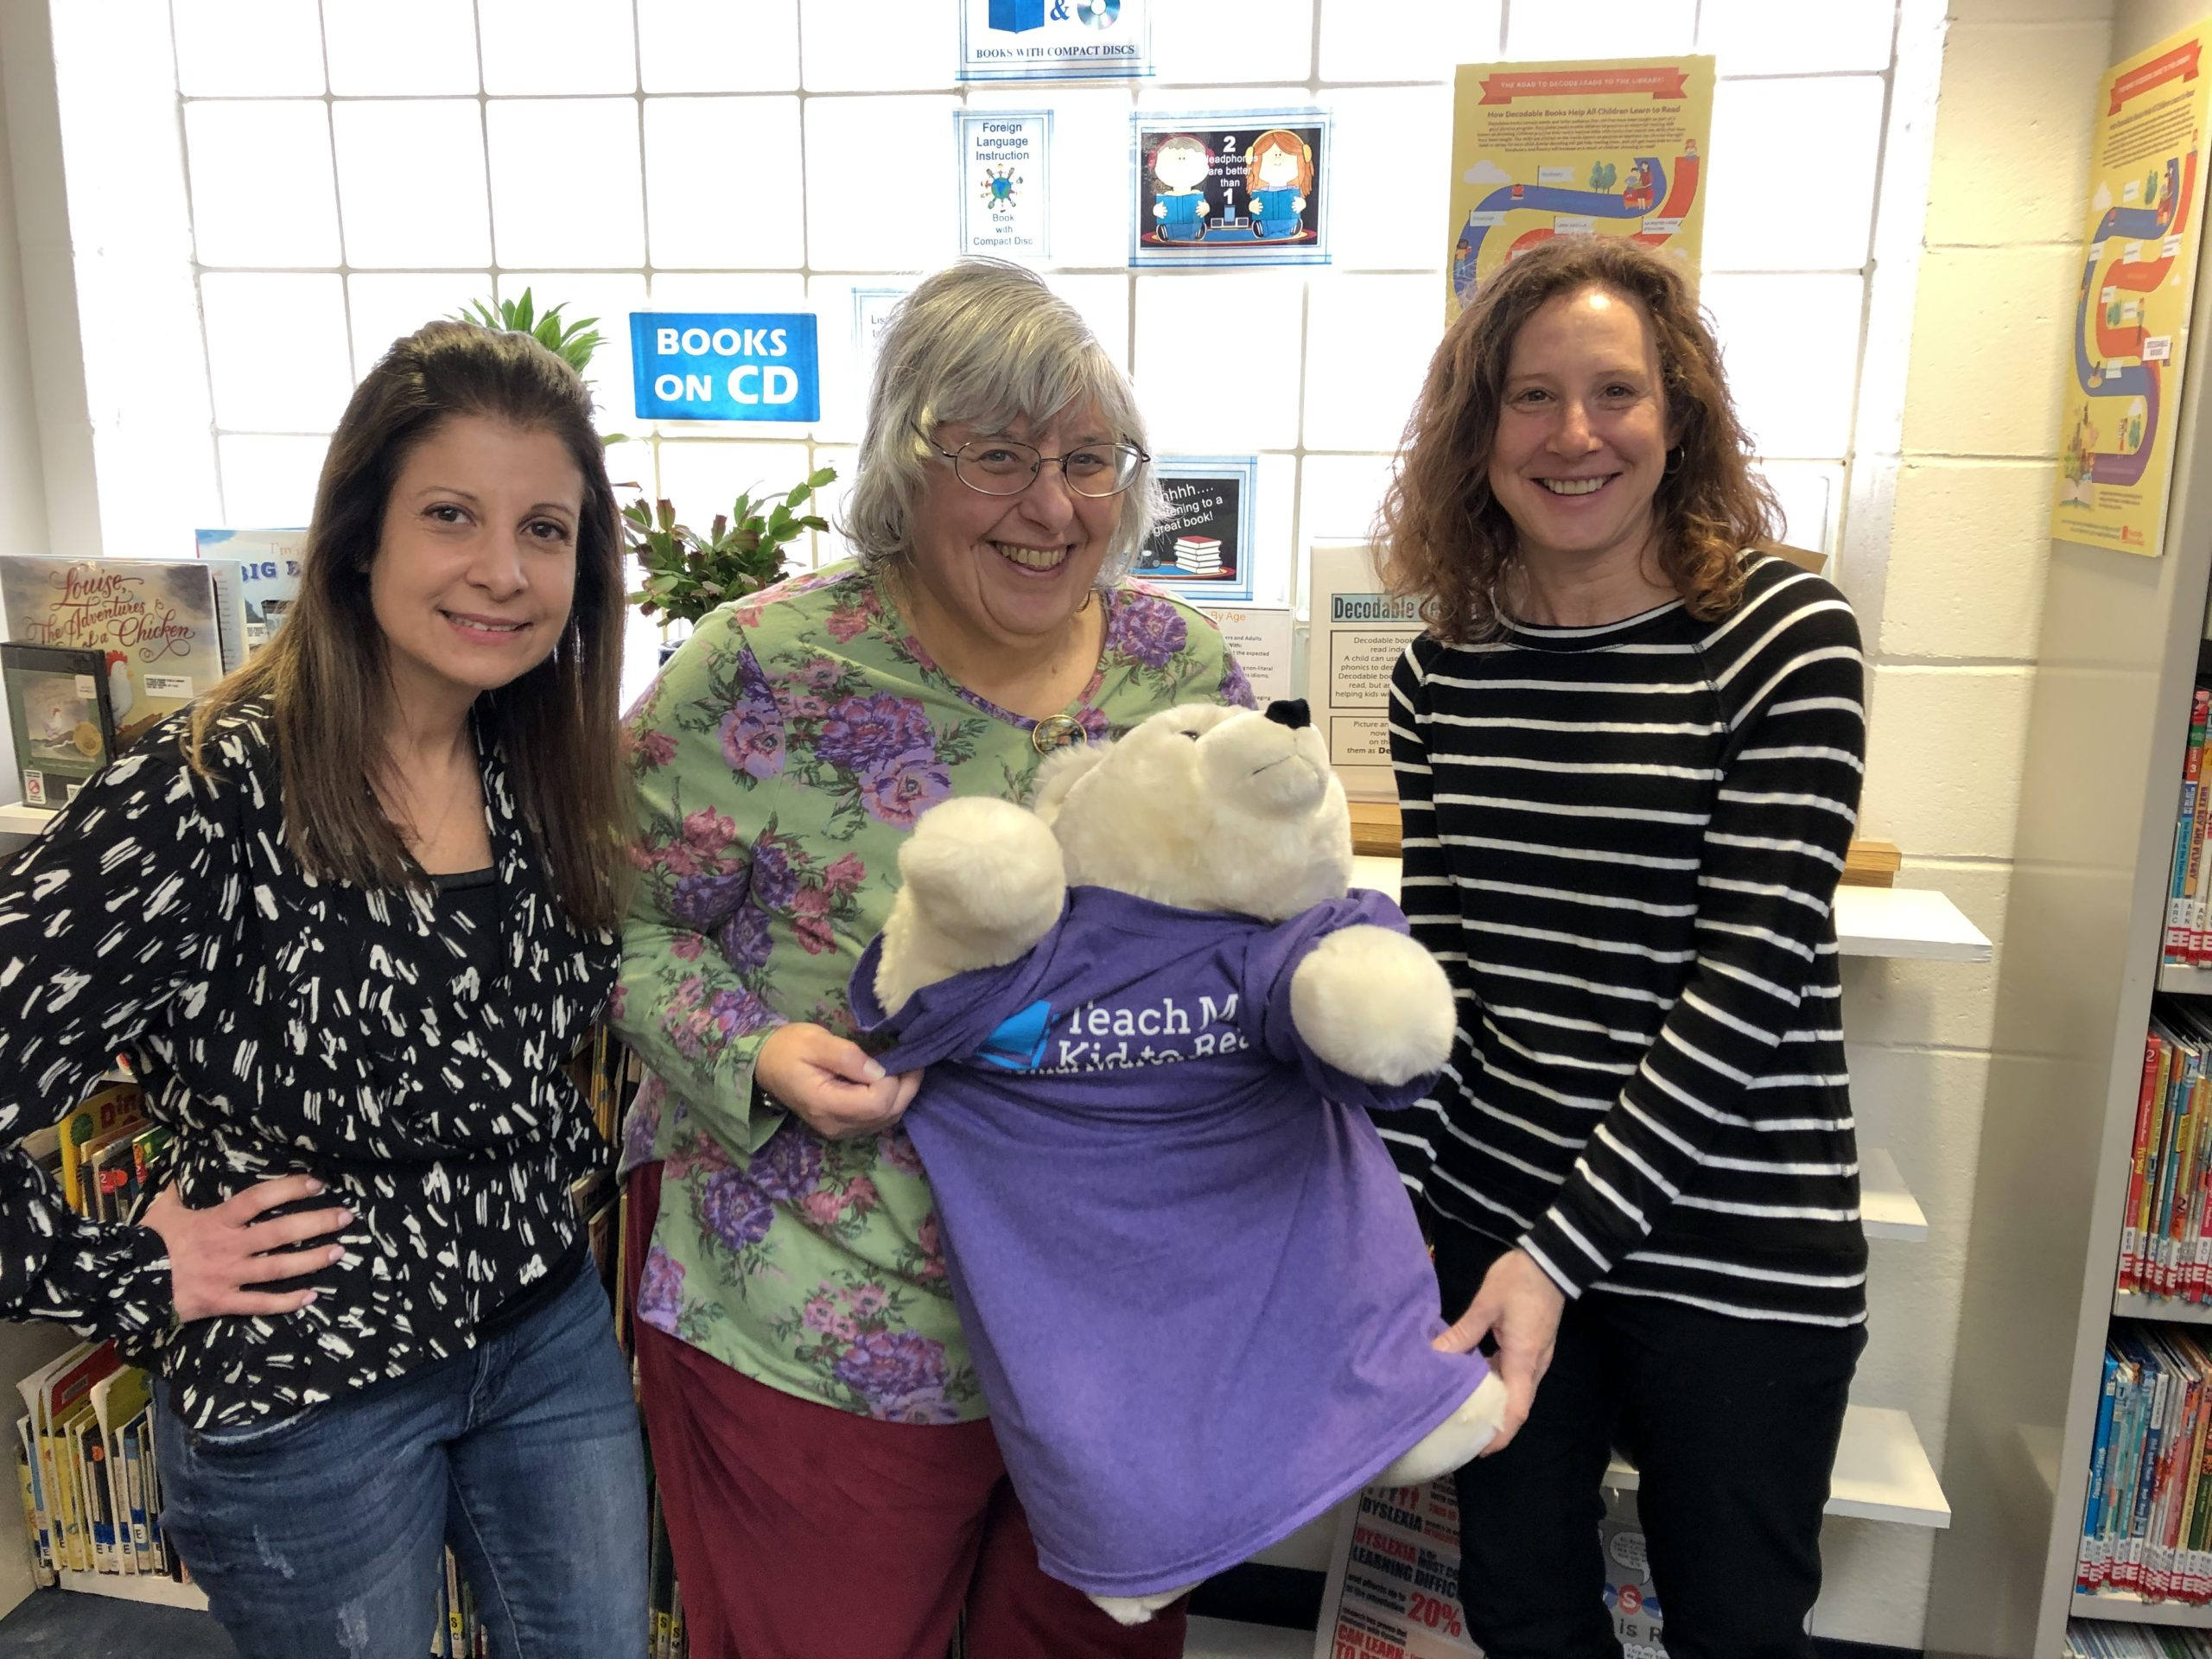 Teach My Kid to Read members and librarian Faye Lieberman, holding a stuffed bear